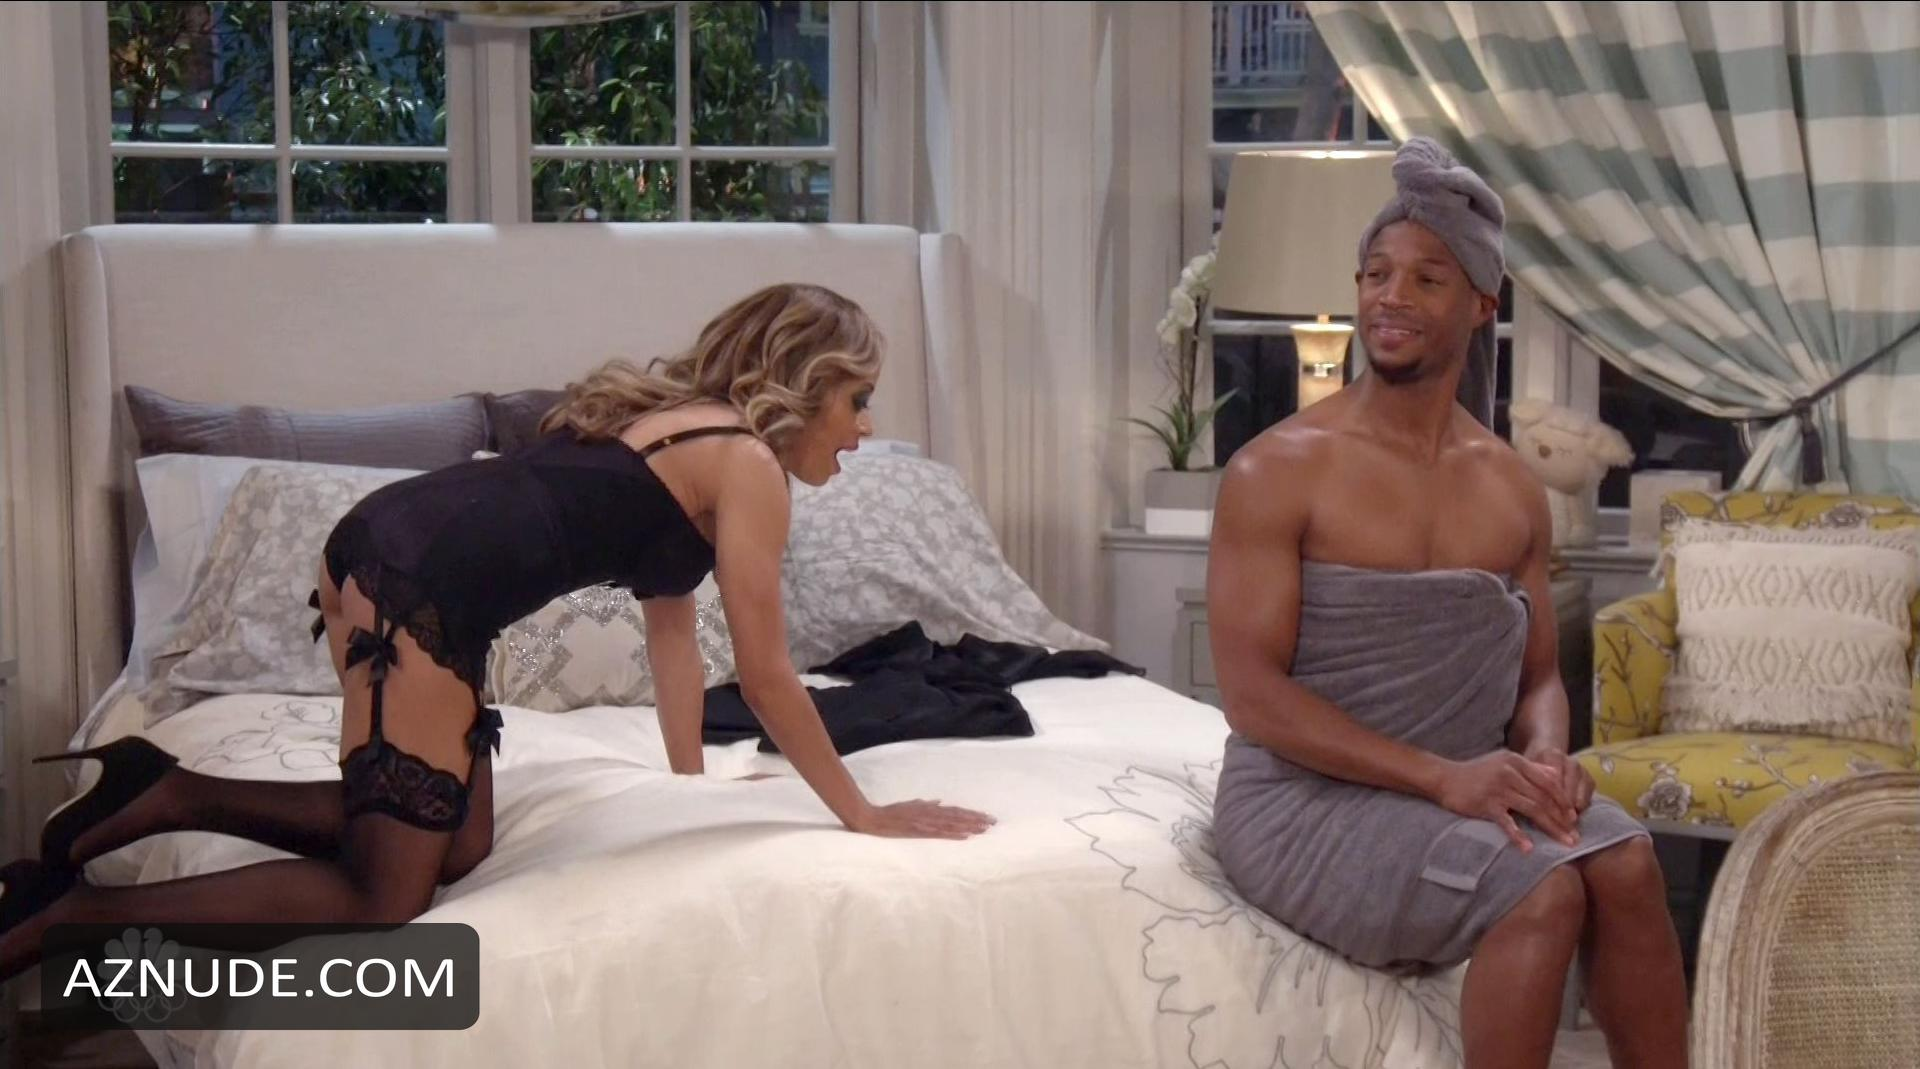 Atkins sex scene naked essence